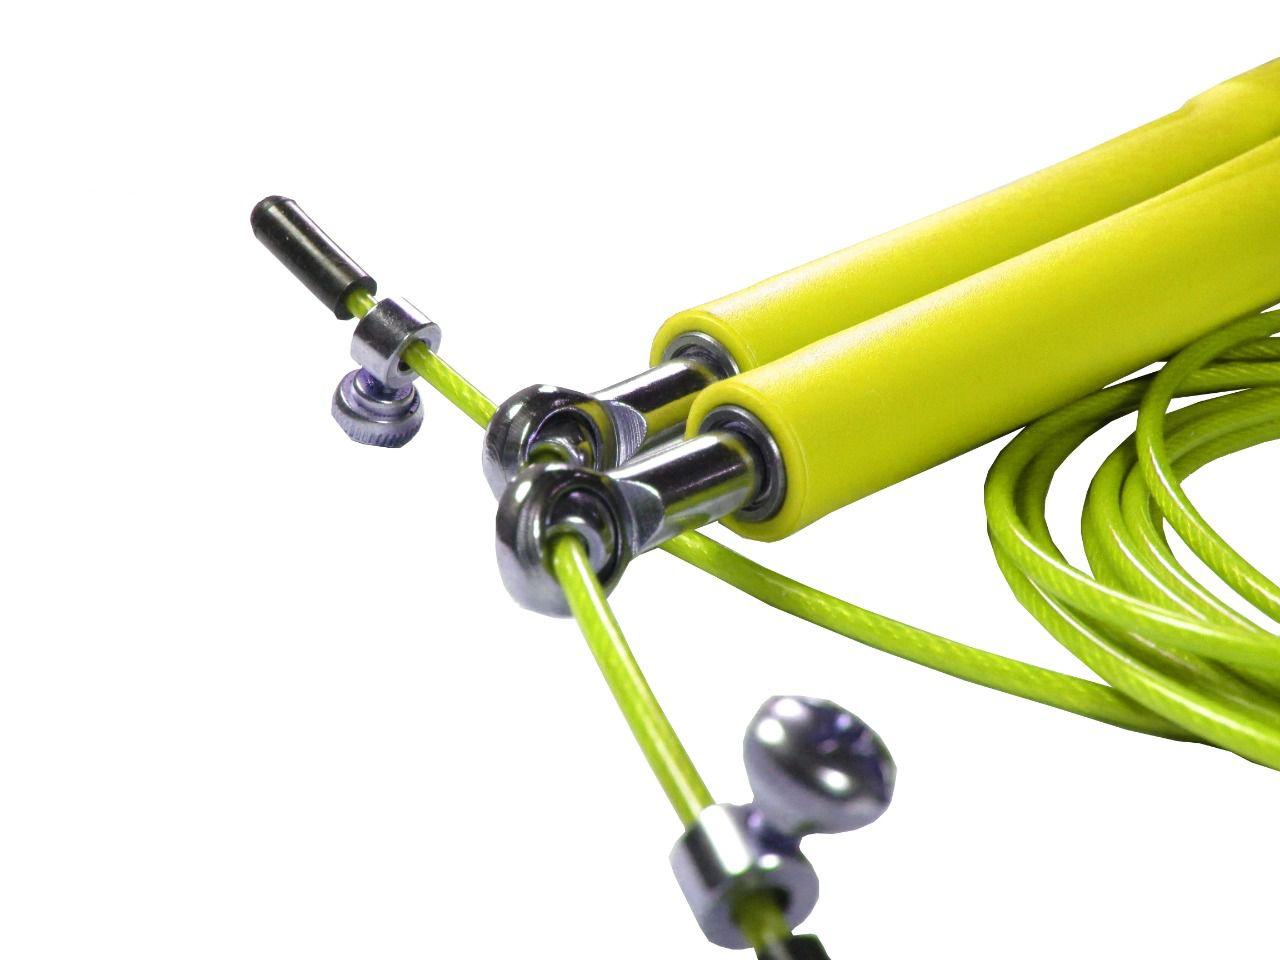 Corda De Pular Speed Rope 2 Rolamento / PVC Amarelo